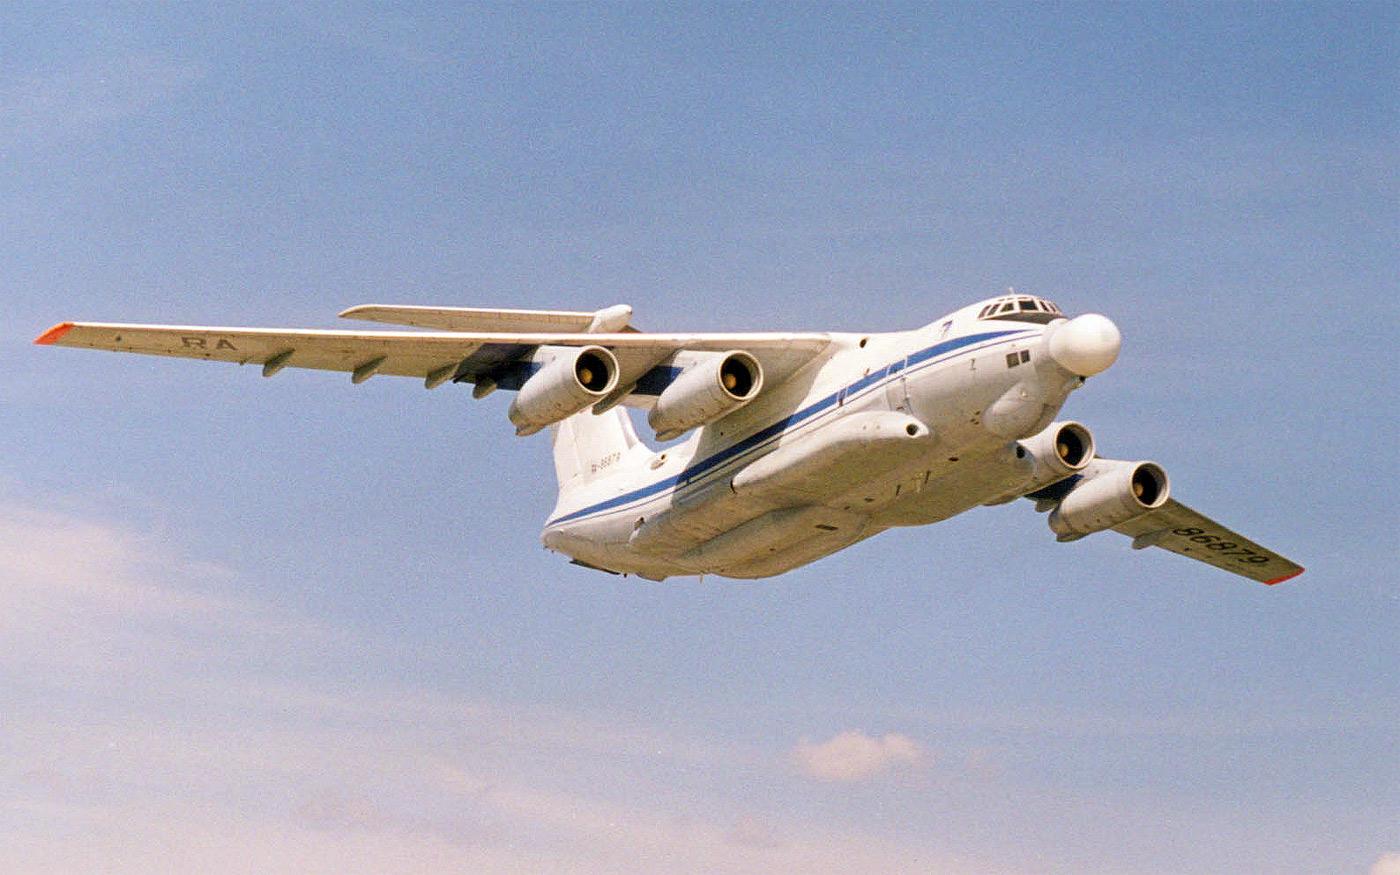 Самолет А-60 / 1А2 (http://beriev.com)